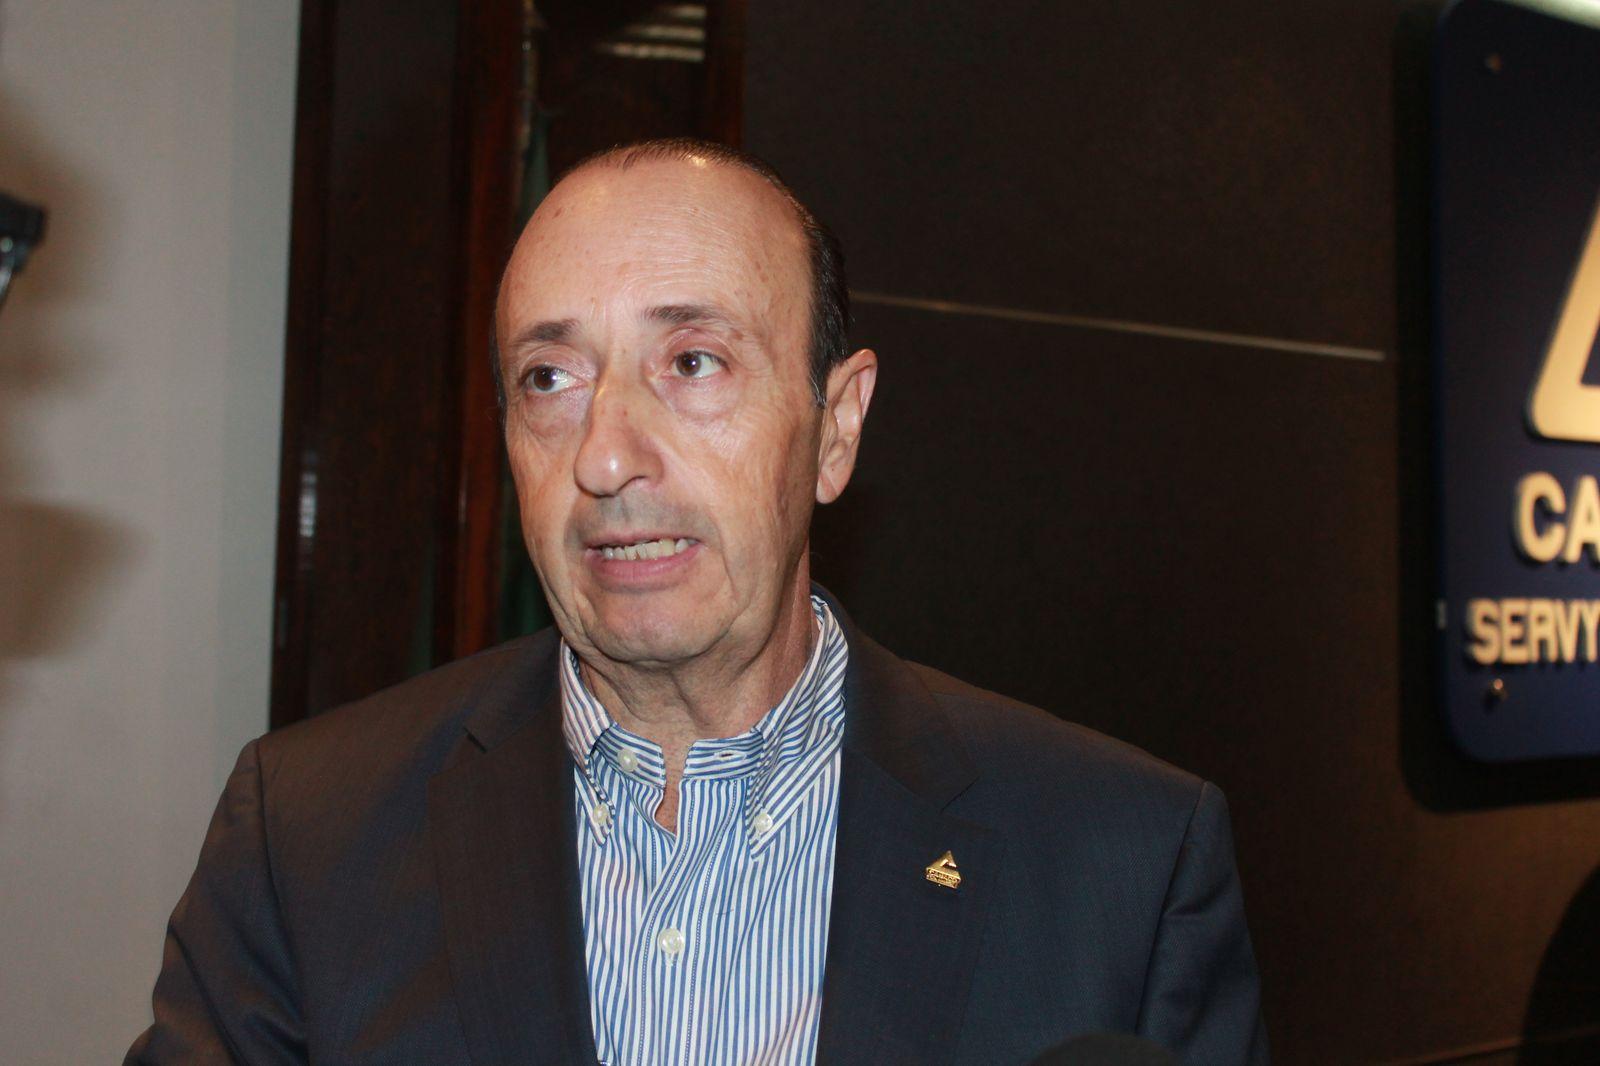 Avalan Empresarios A Lara Rend N # Muebles Rogelio Gonzalez